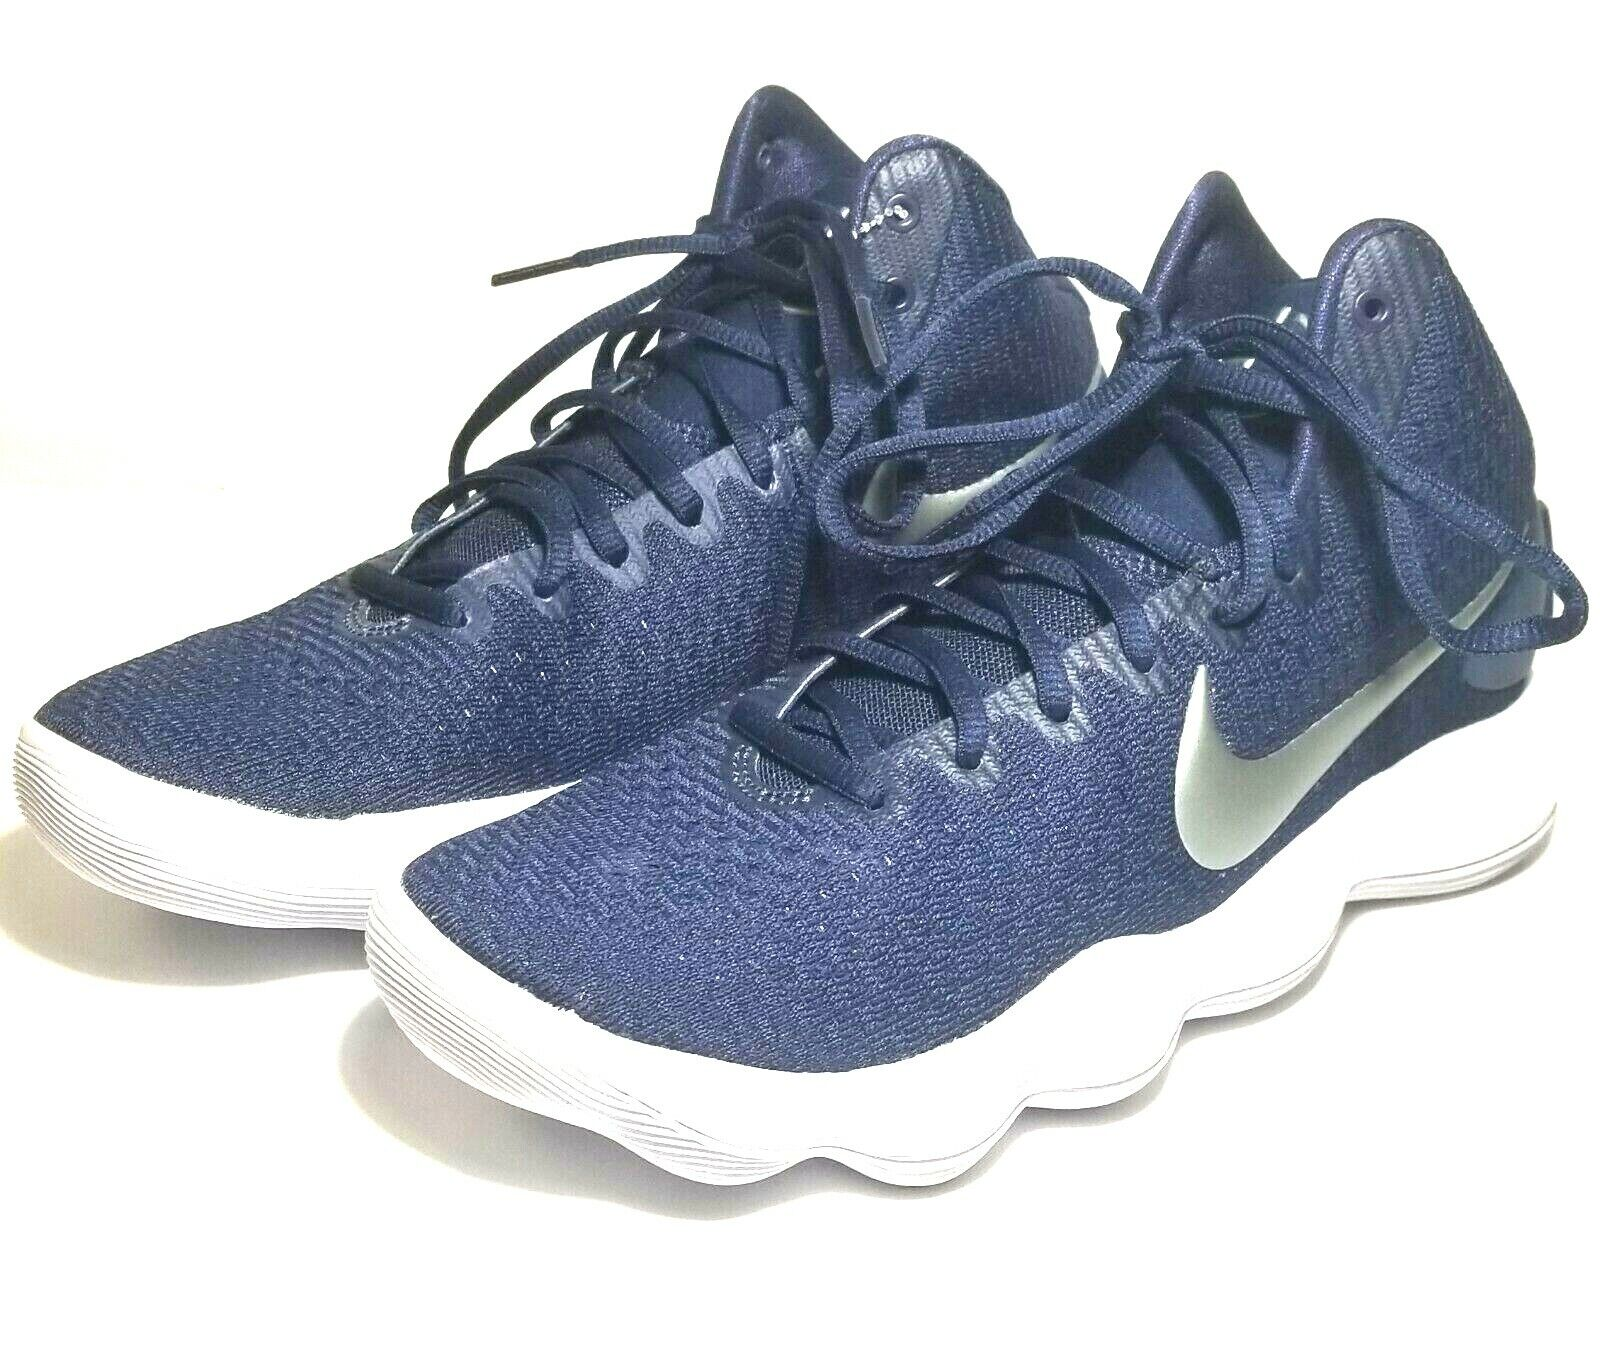 best loved aa952 39ed9 Nike Hyperdunk Hyperdunk Hyperdunk 2017 TB Basketball shoes Navy Silver  897808-400 Mens size 7